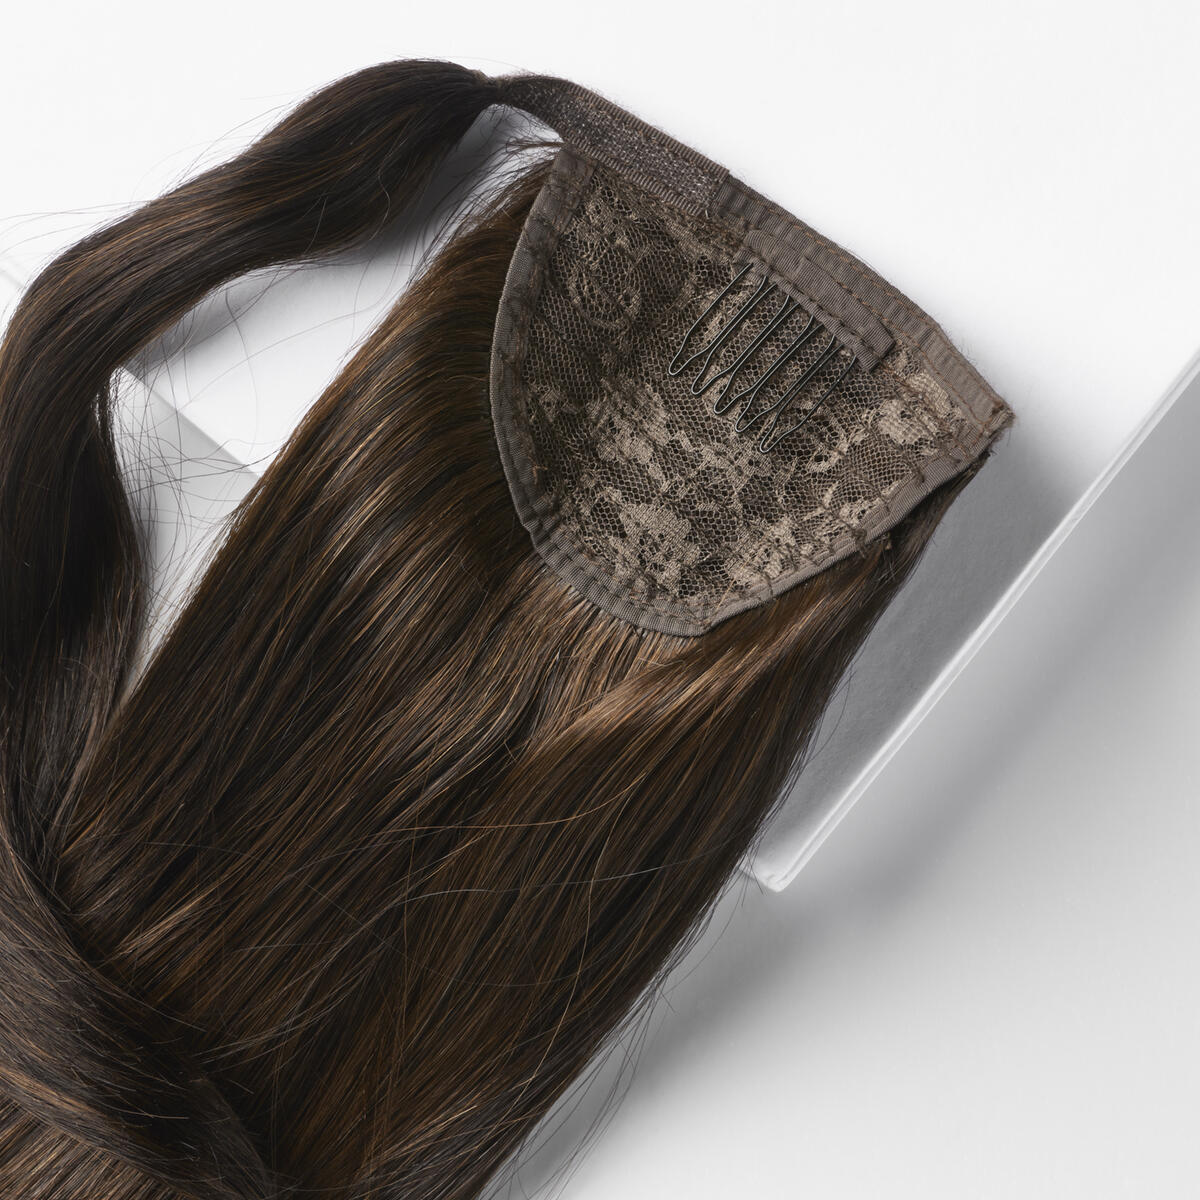 Clip-in Ponytail C2.0/2.3 Deep Brown Caramel ColorMelt 50 cm